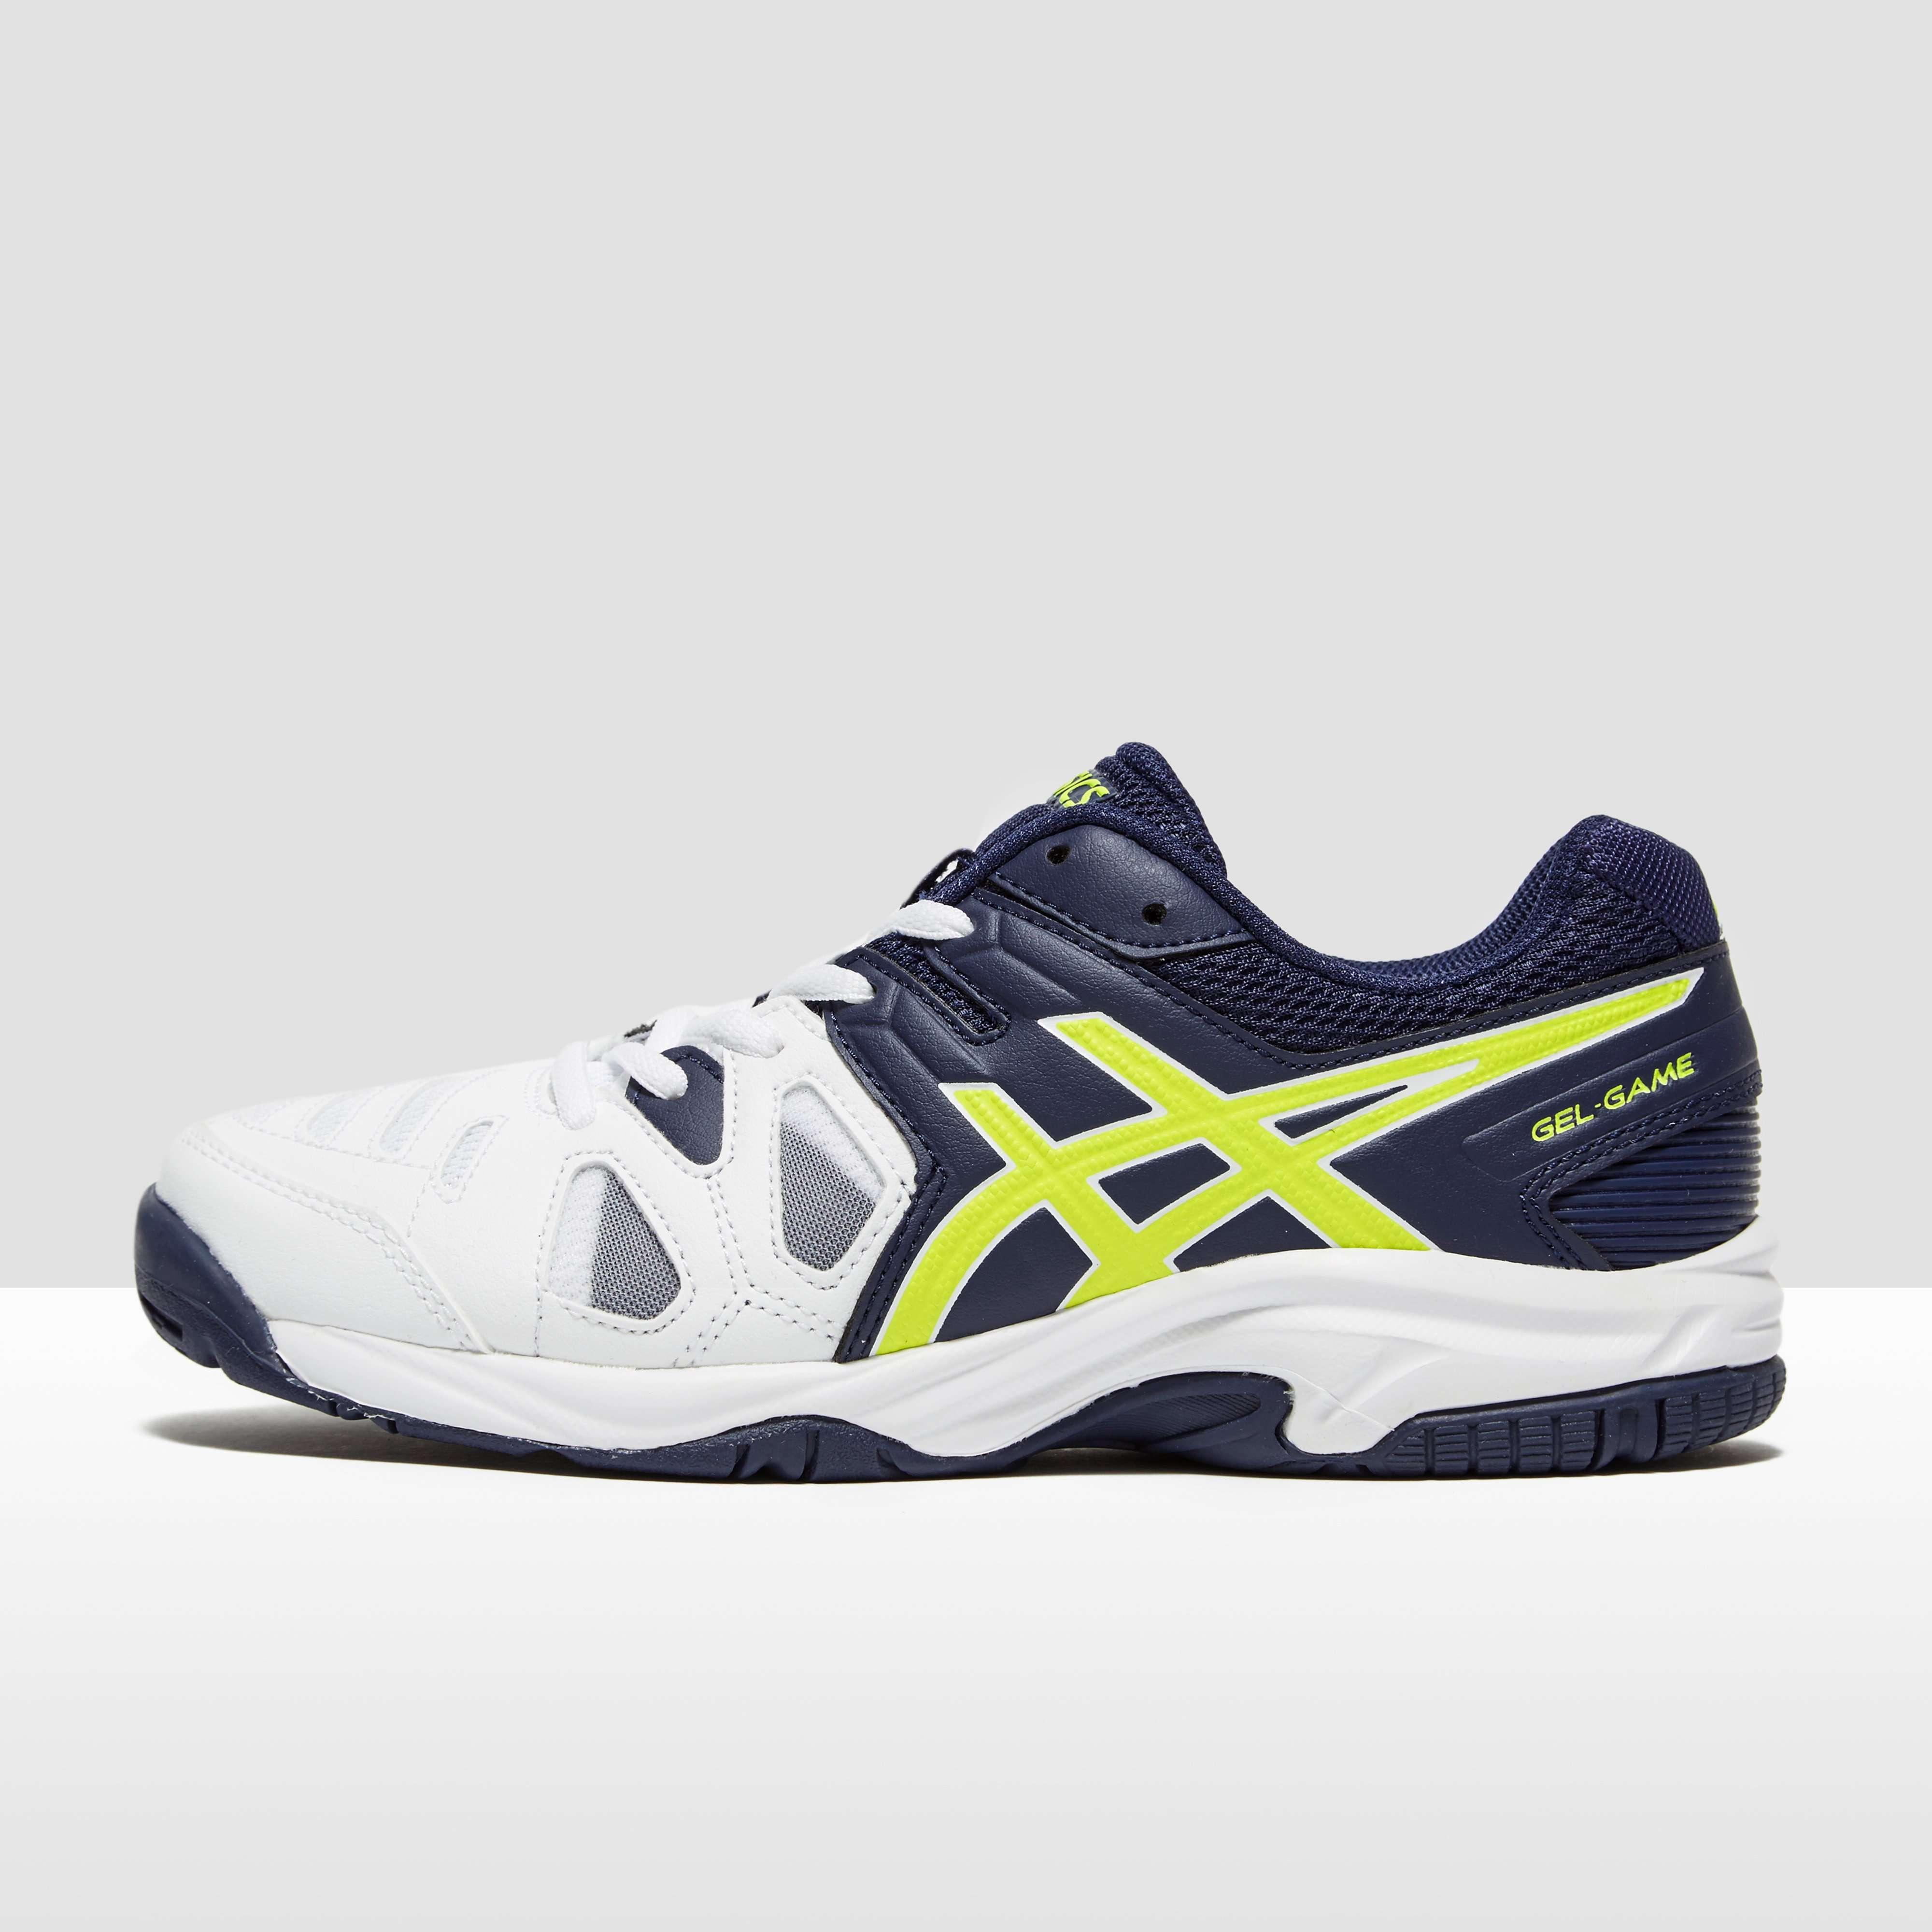 asics junior gel game tennis shoes